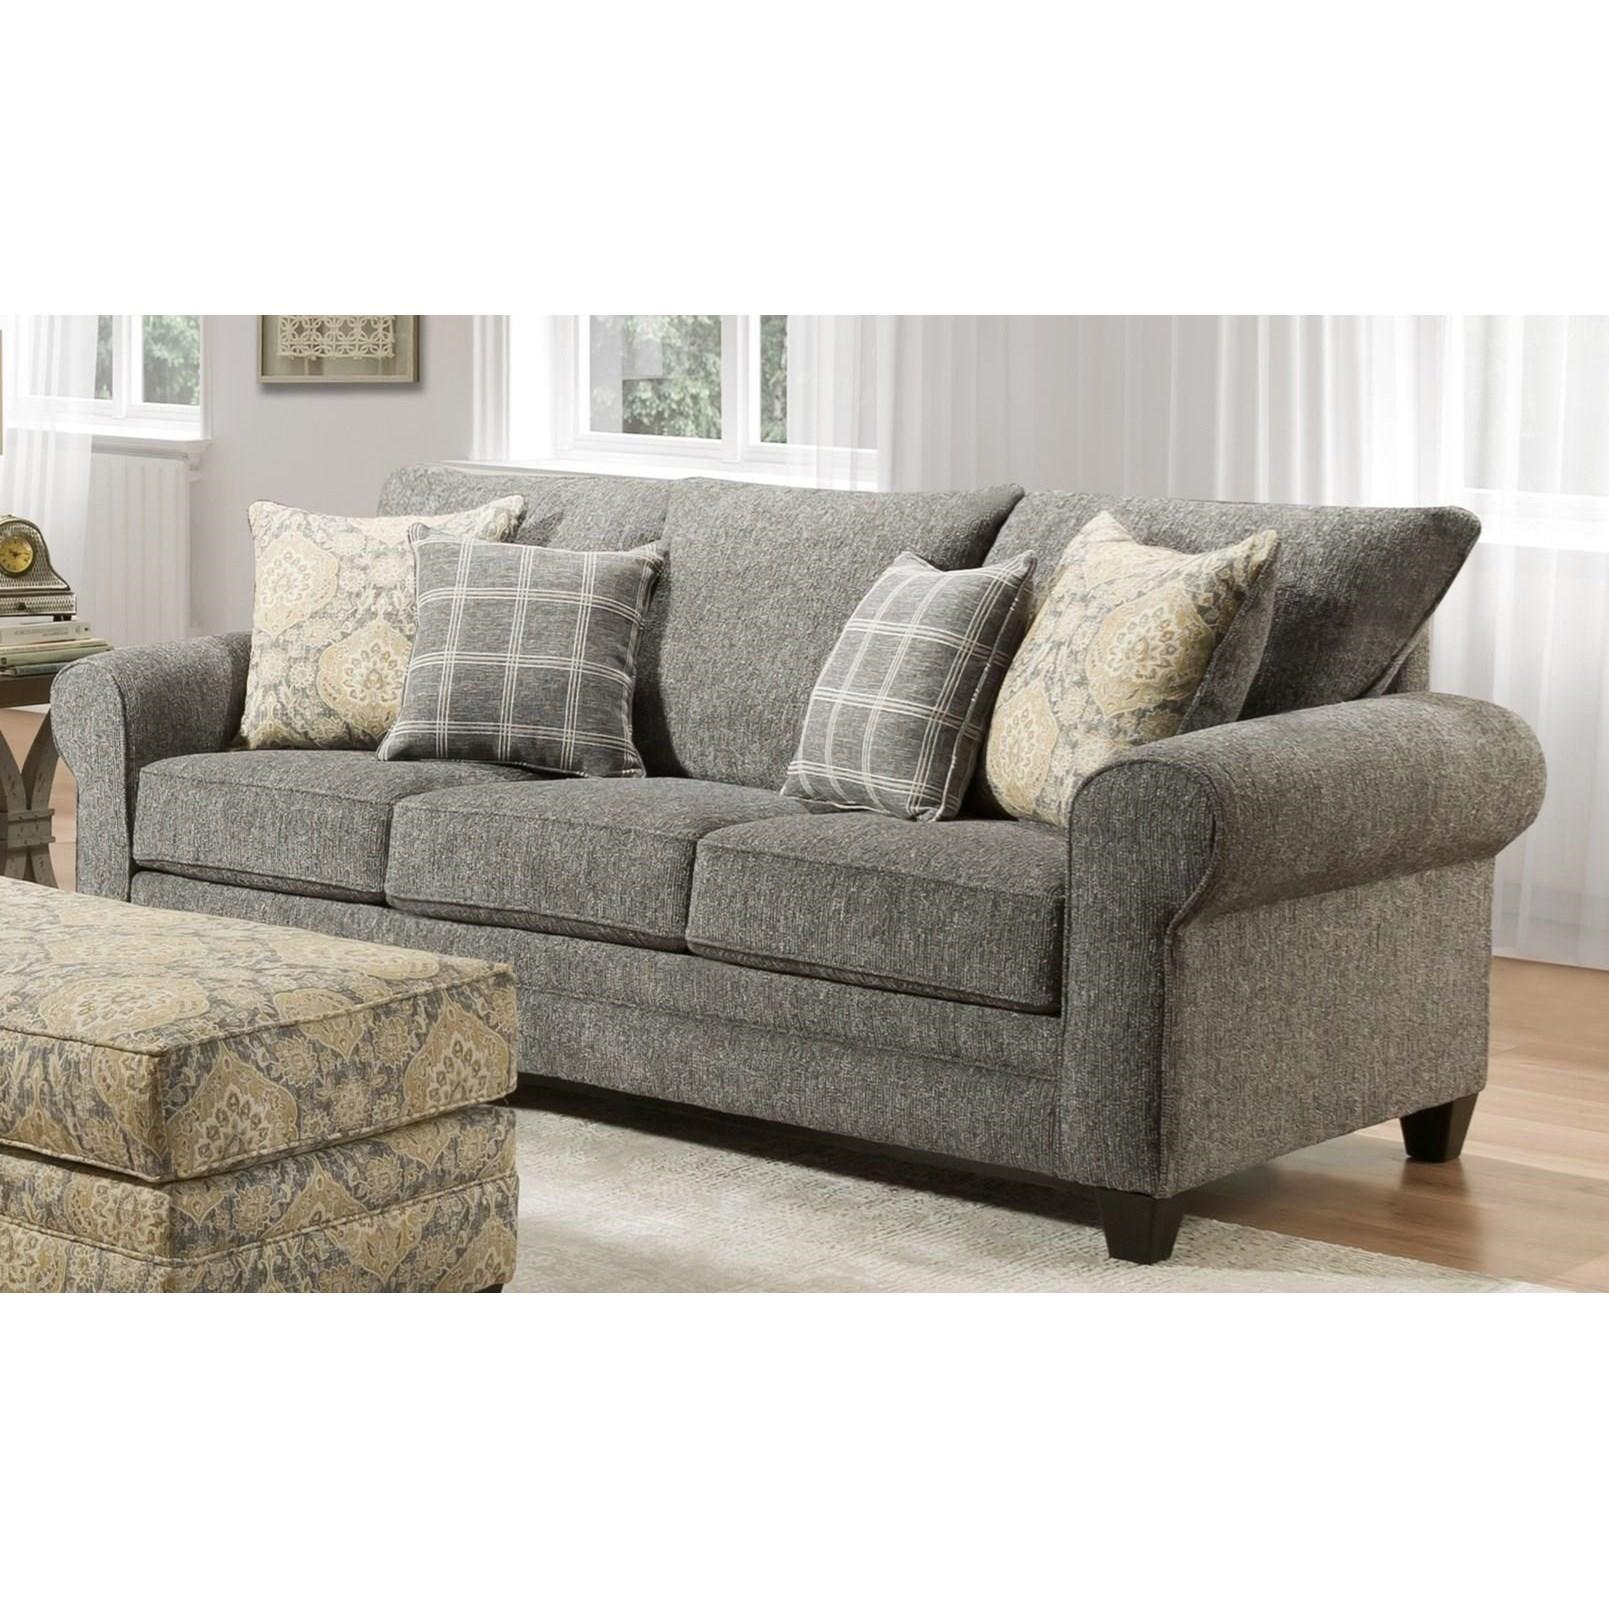 4170 Sofa  by Peak Living at Prime Brothers Furniture